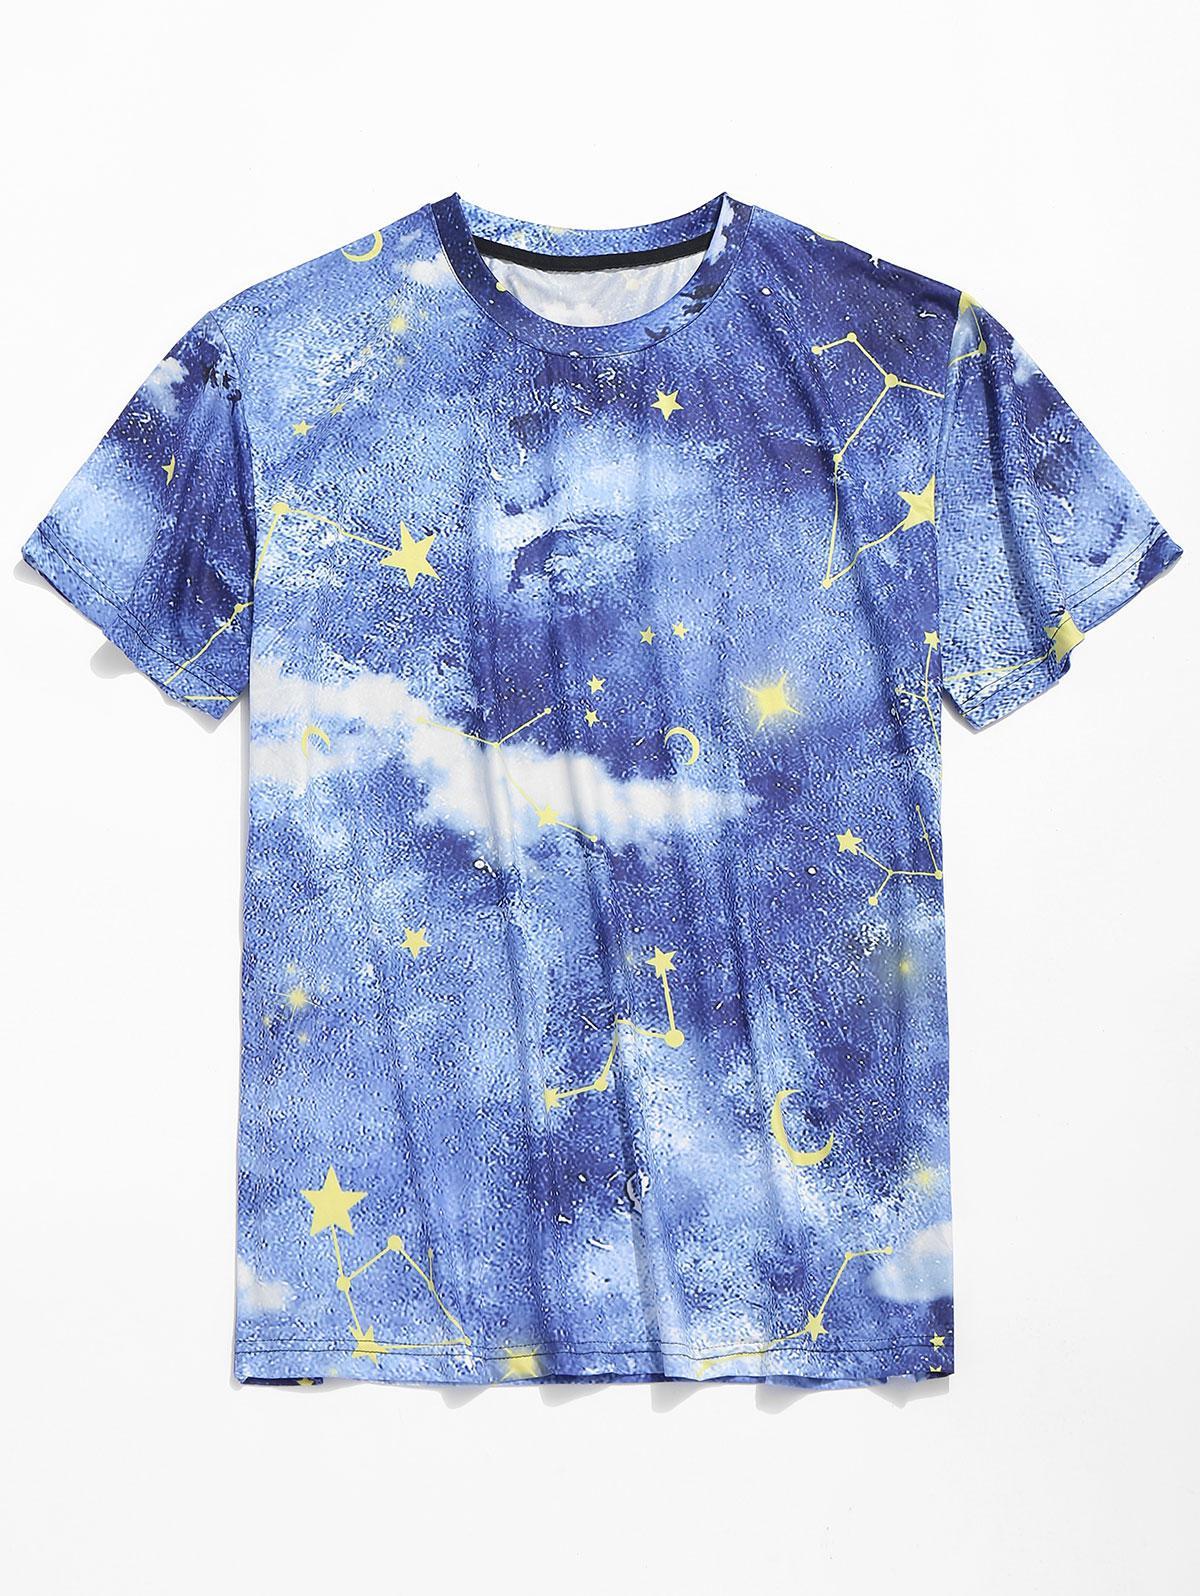 Short Sleeves Galaxy Star Moon Print T-shirt, Blueberry blue